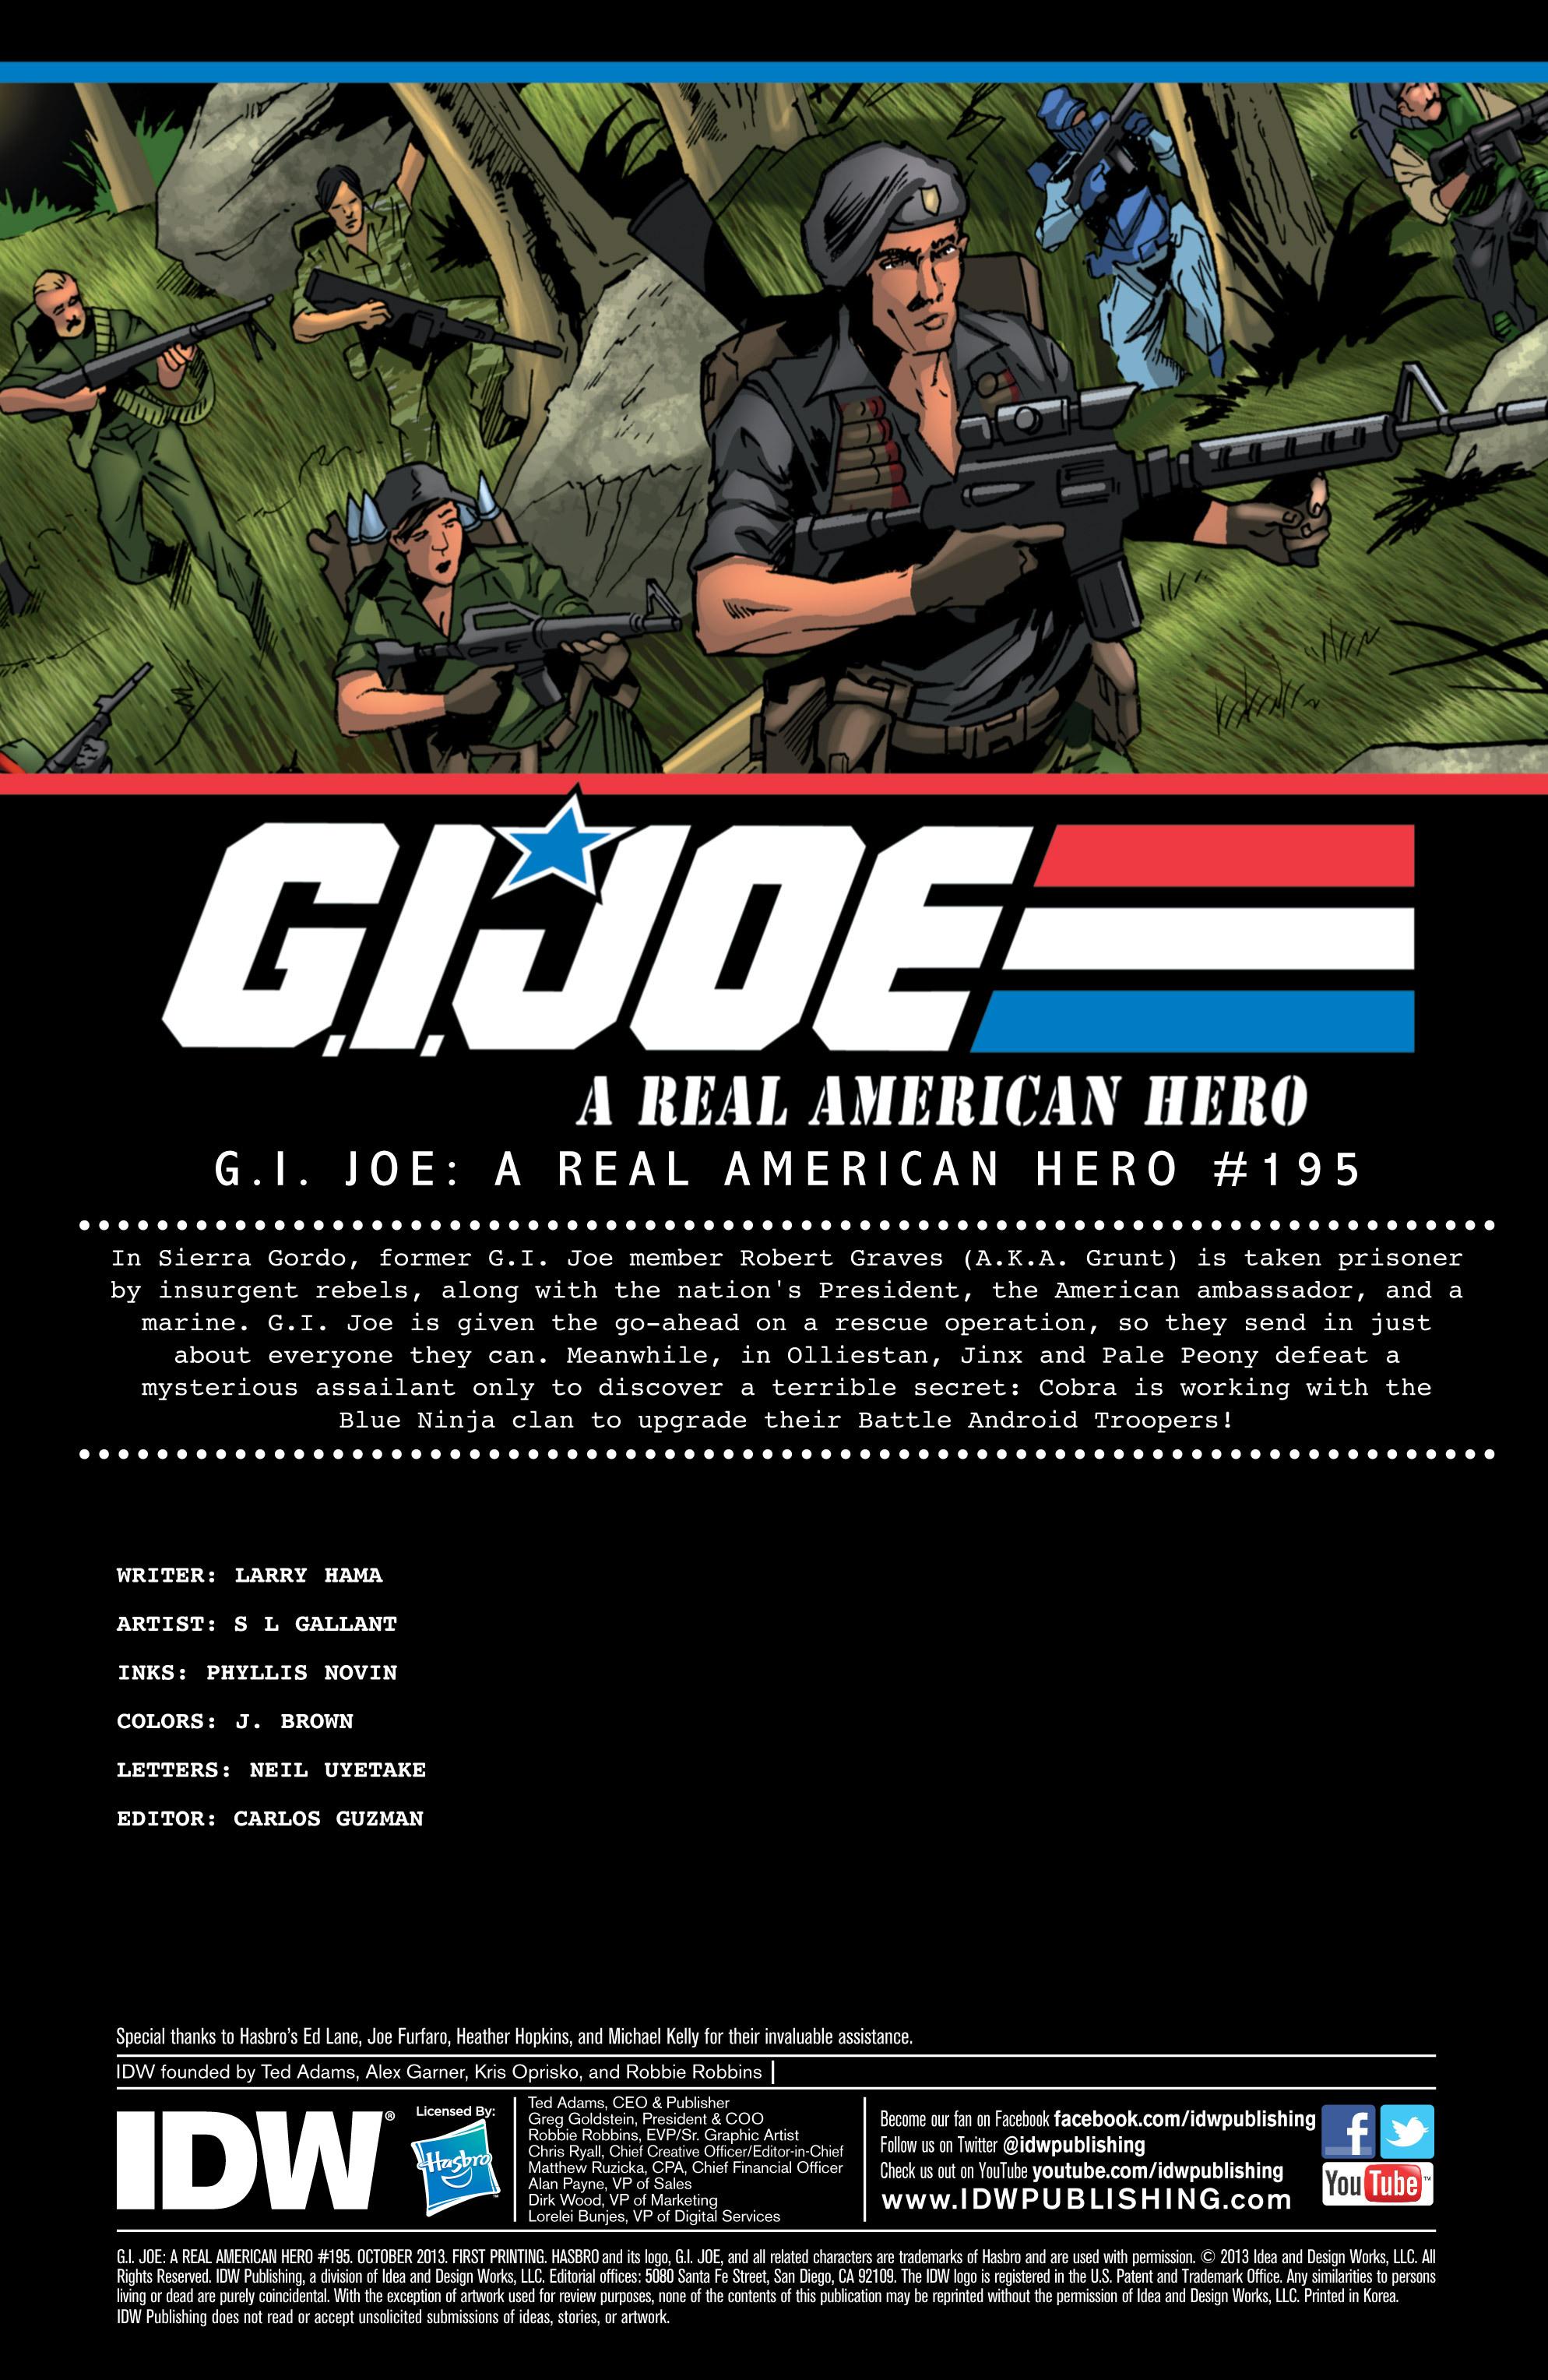 G.I. Joe: A Real American Hero 195 Page 1